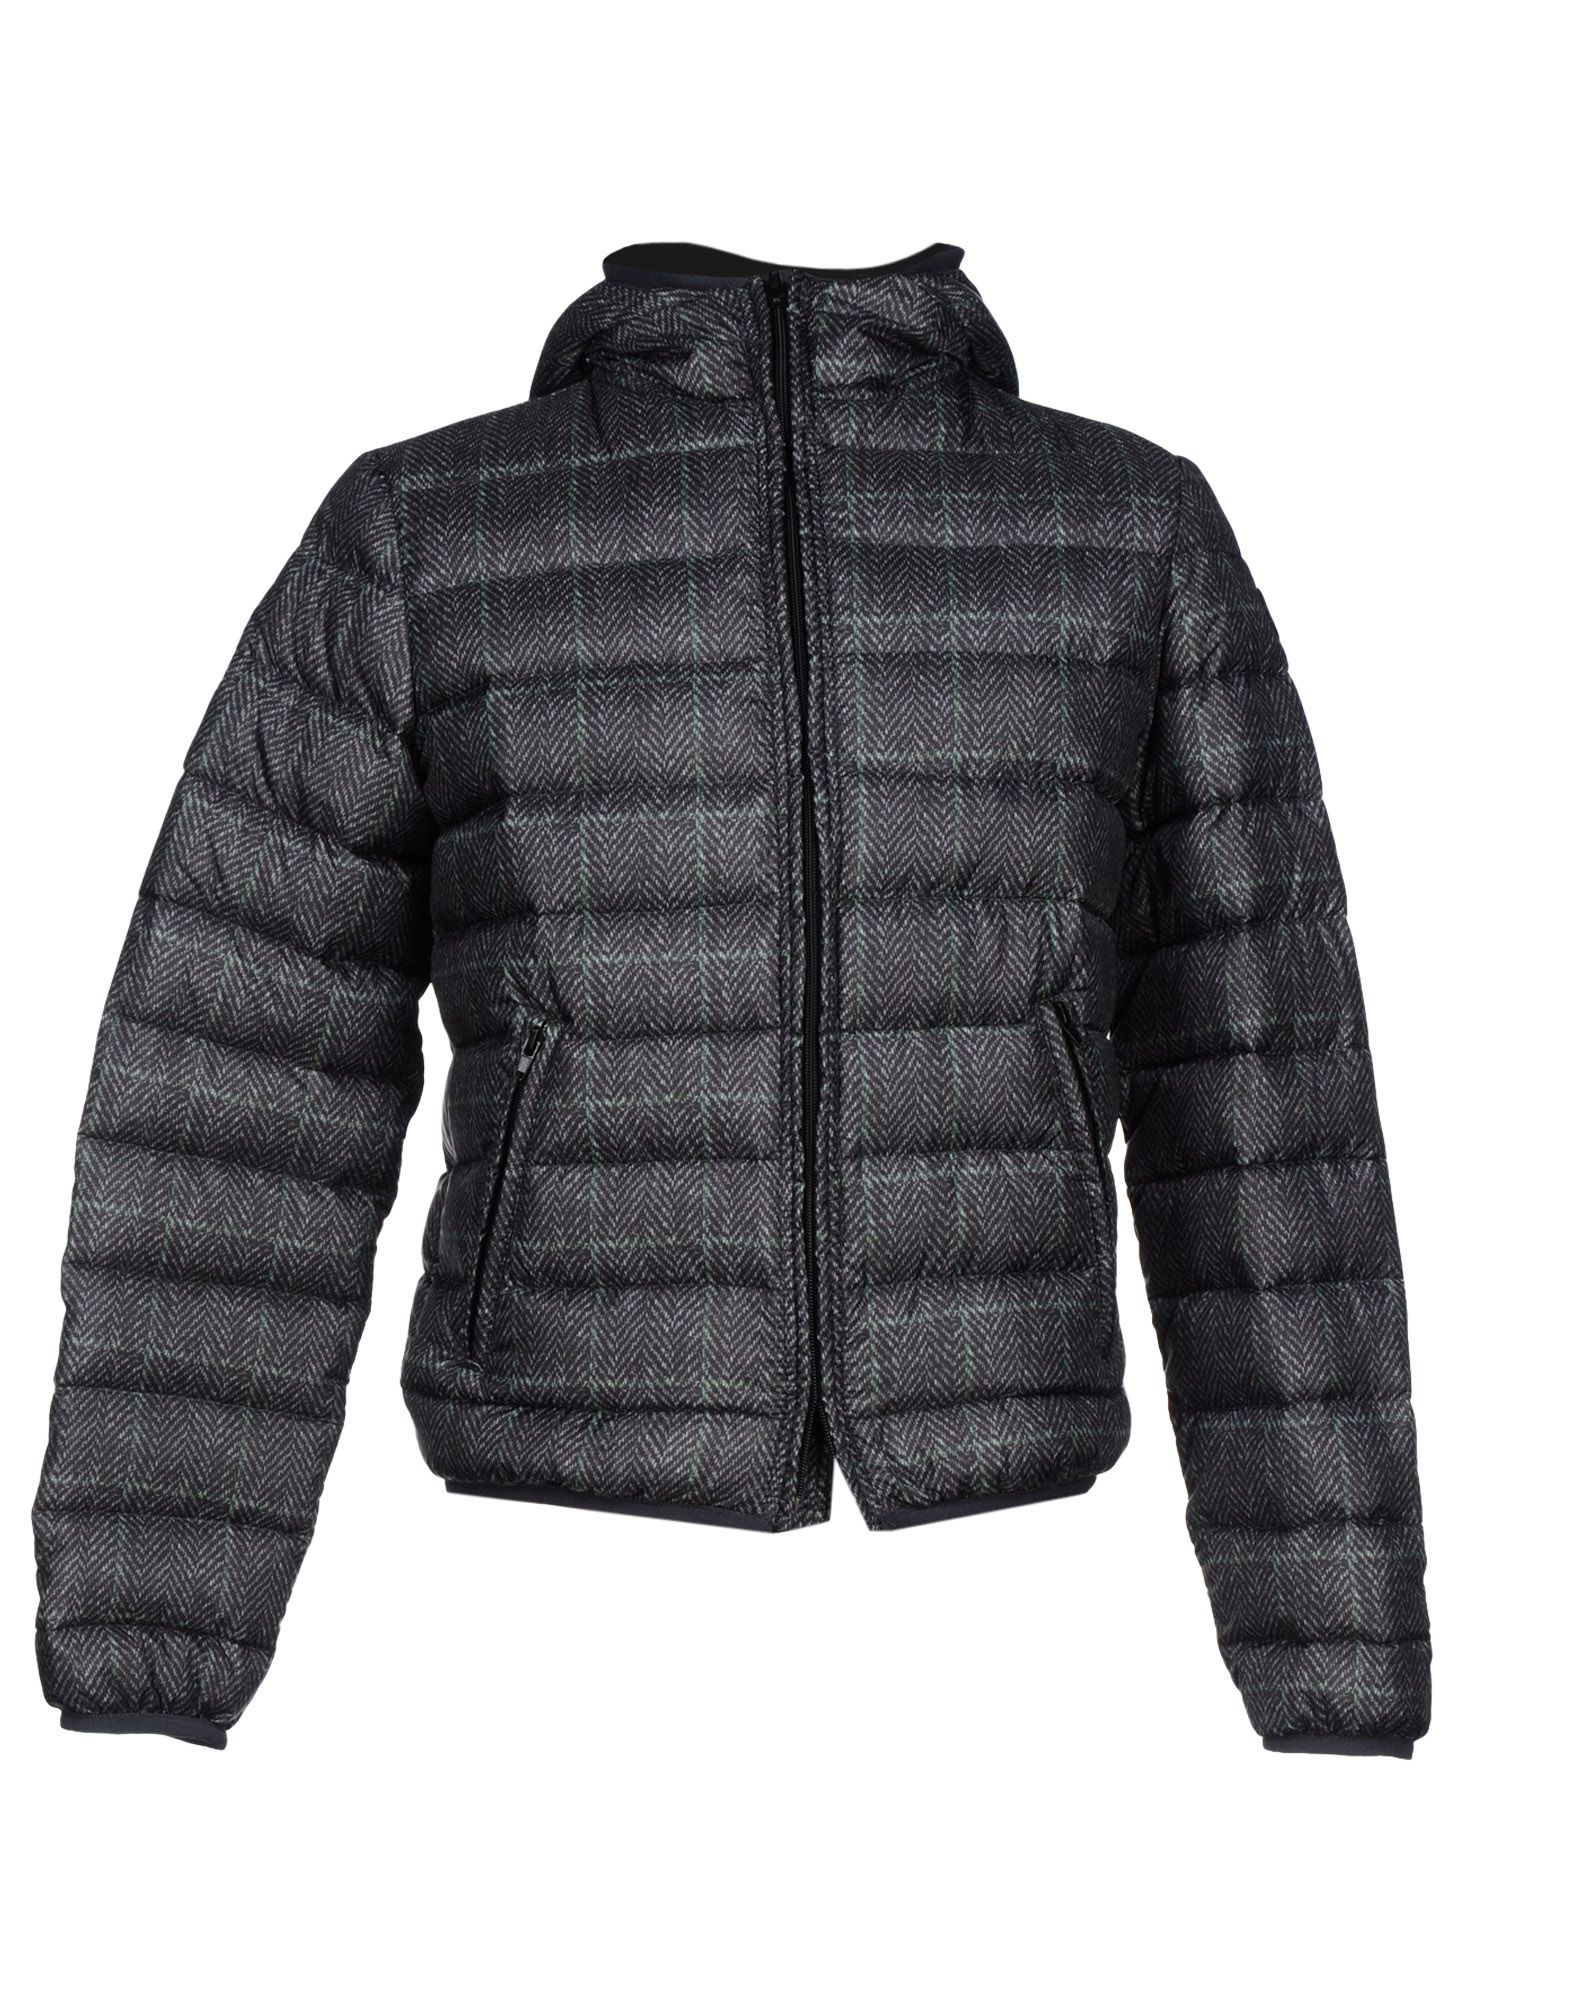 Lyst - Takeshy Kurosawa Down Jacket in Gray for Men